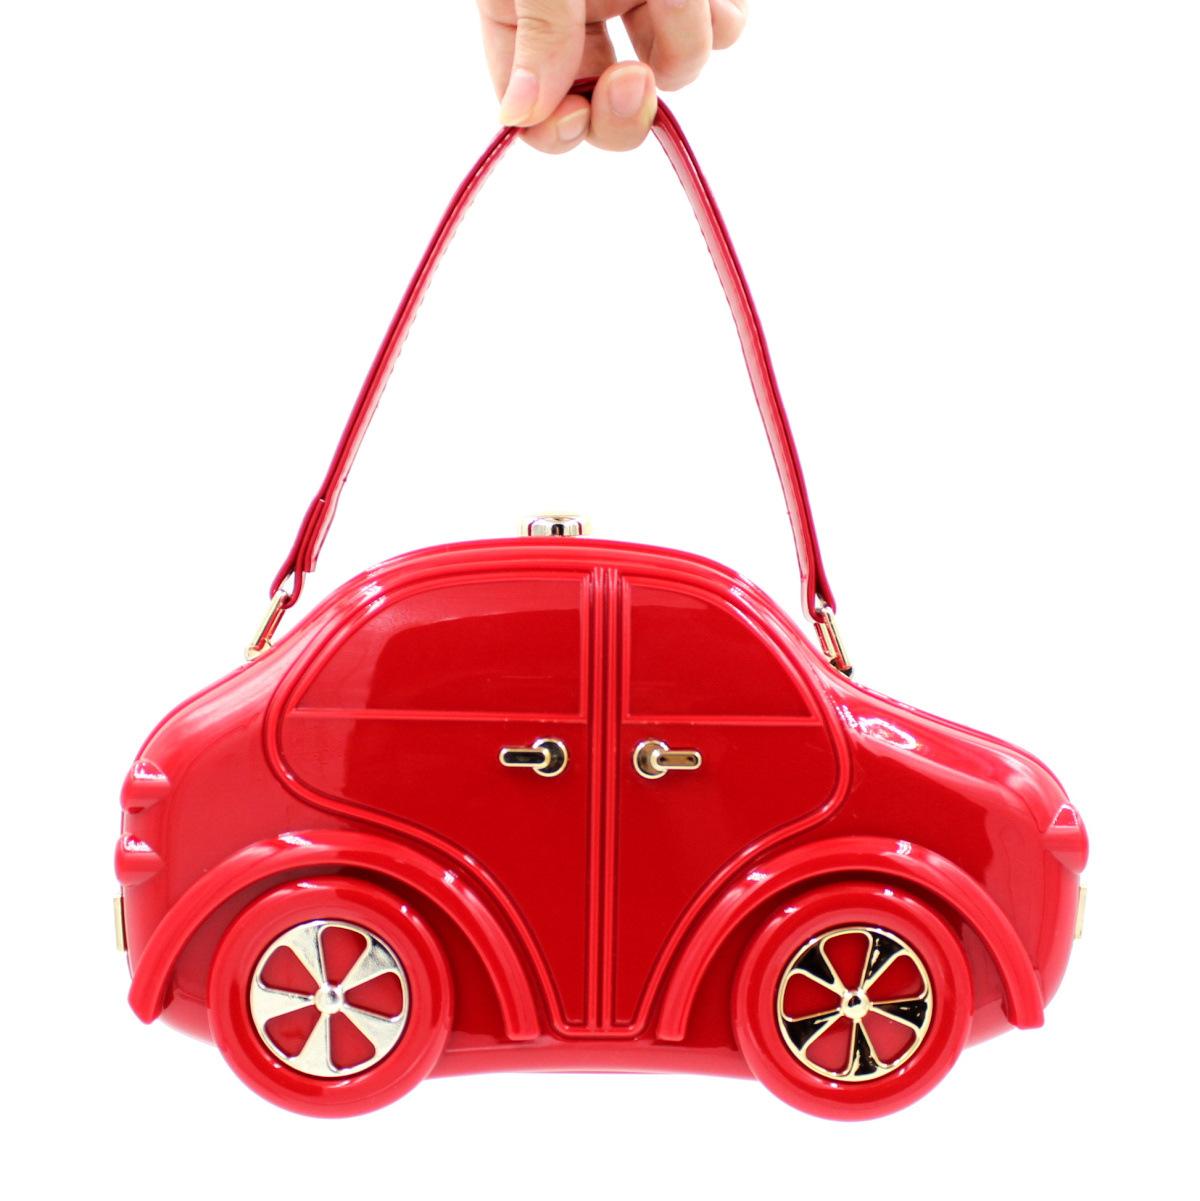 2016 European New Acrylic Red Car Evening Bag Stylish Cute Car Model Day Clutch Vintage Part Handbag R335(China (Mainland))